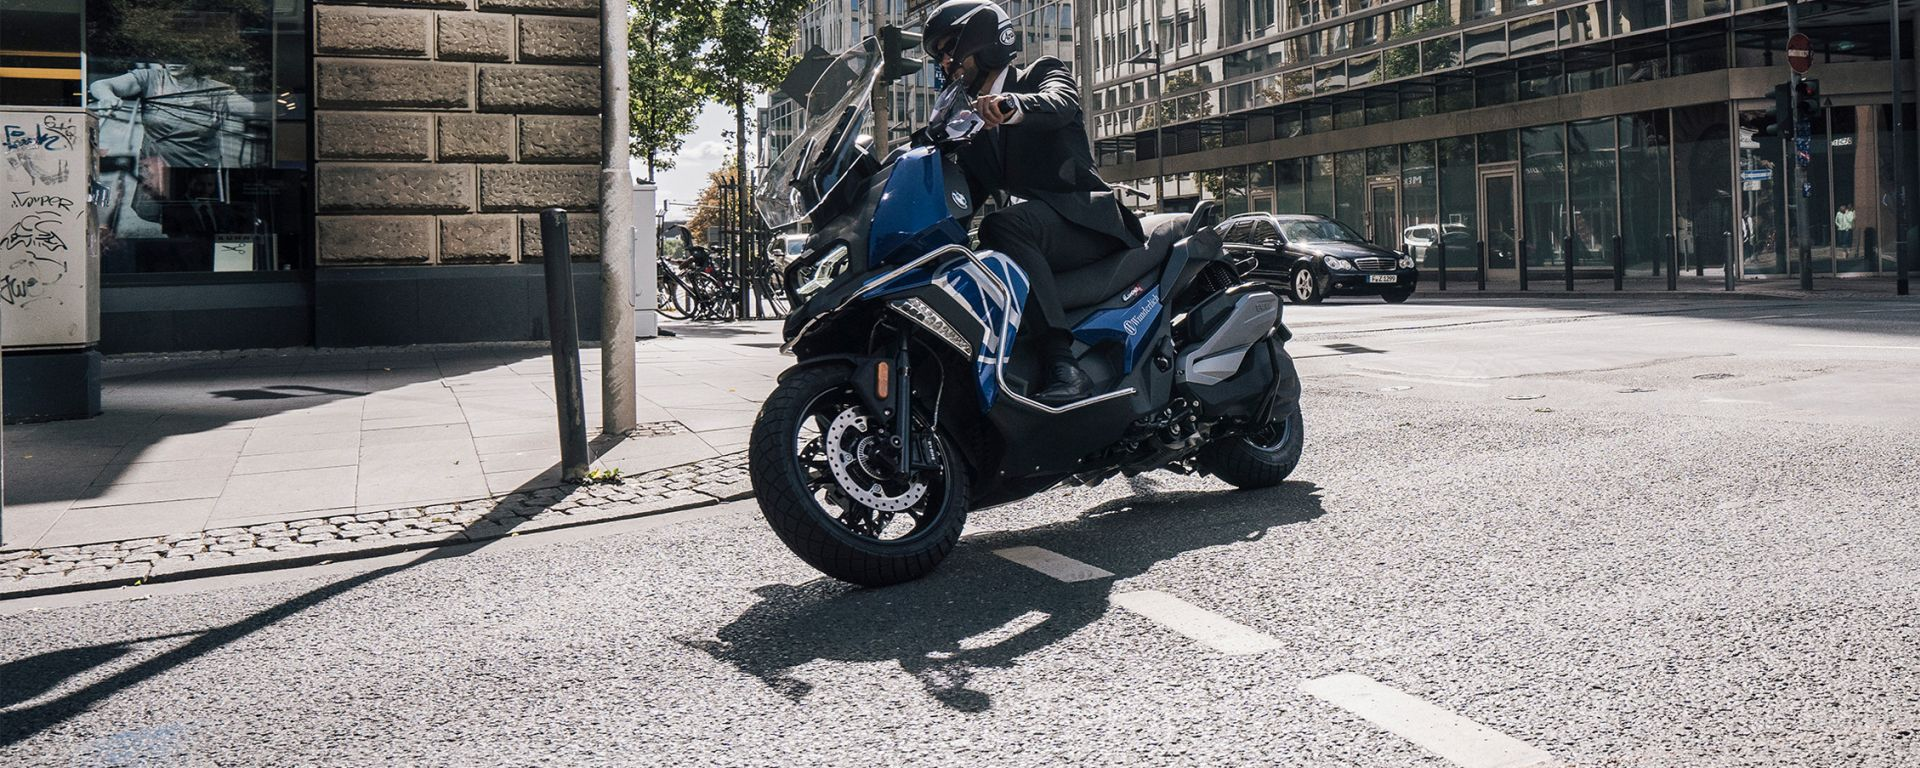 BMW C 400 X: lo scooter è l'ultimo a beneficiare del sistema Wunderlich Vario